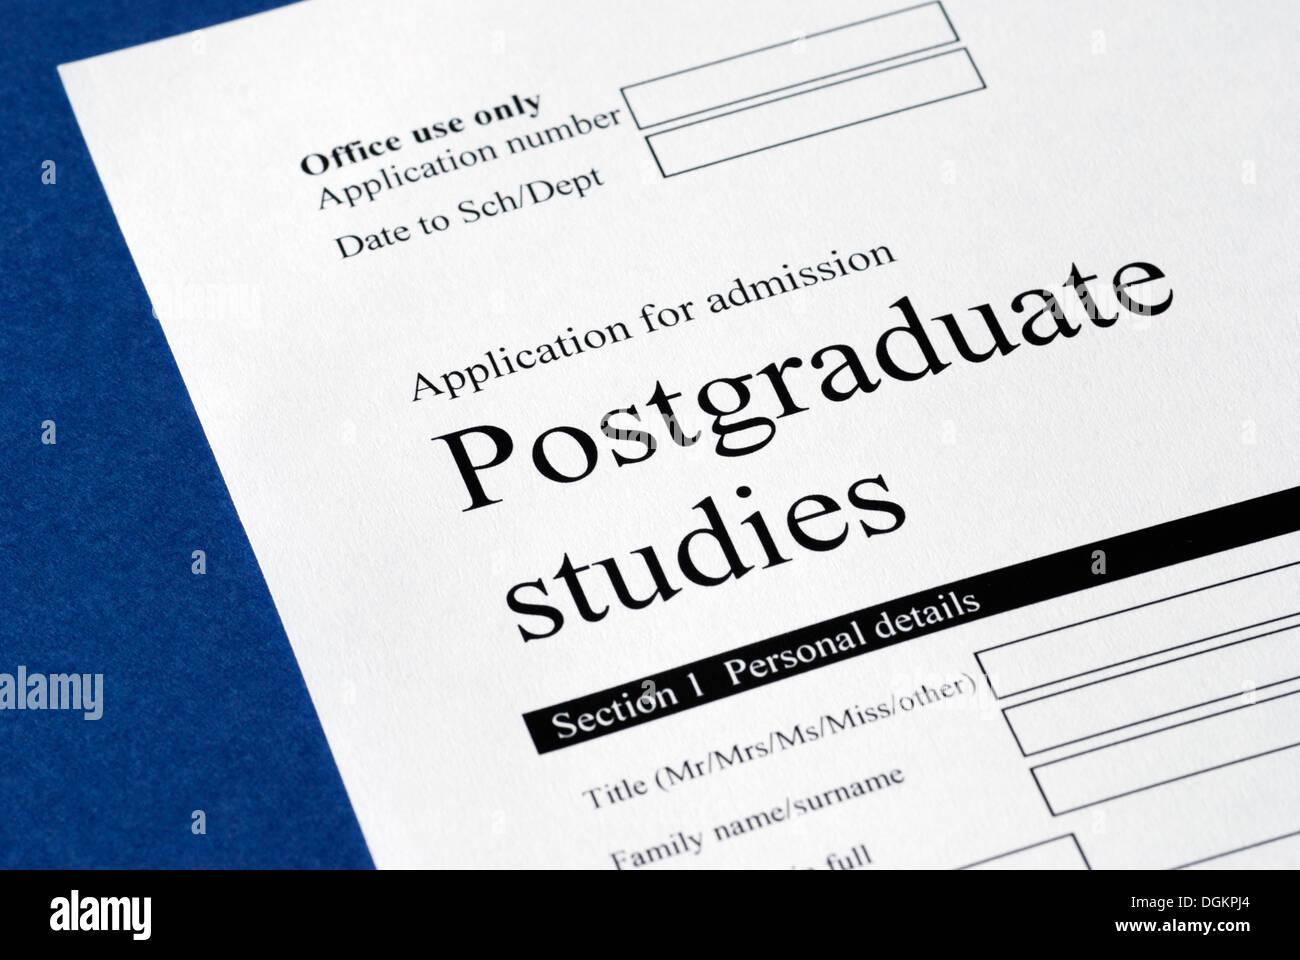 Postgraduate studies application form. - Stock Image